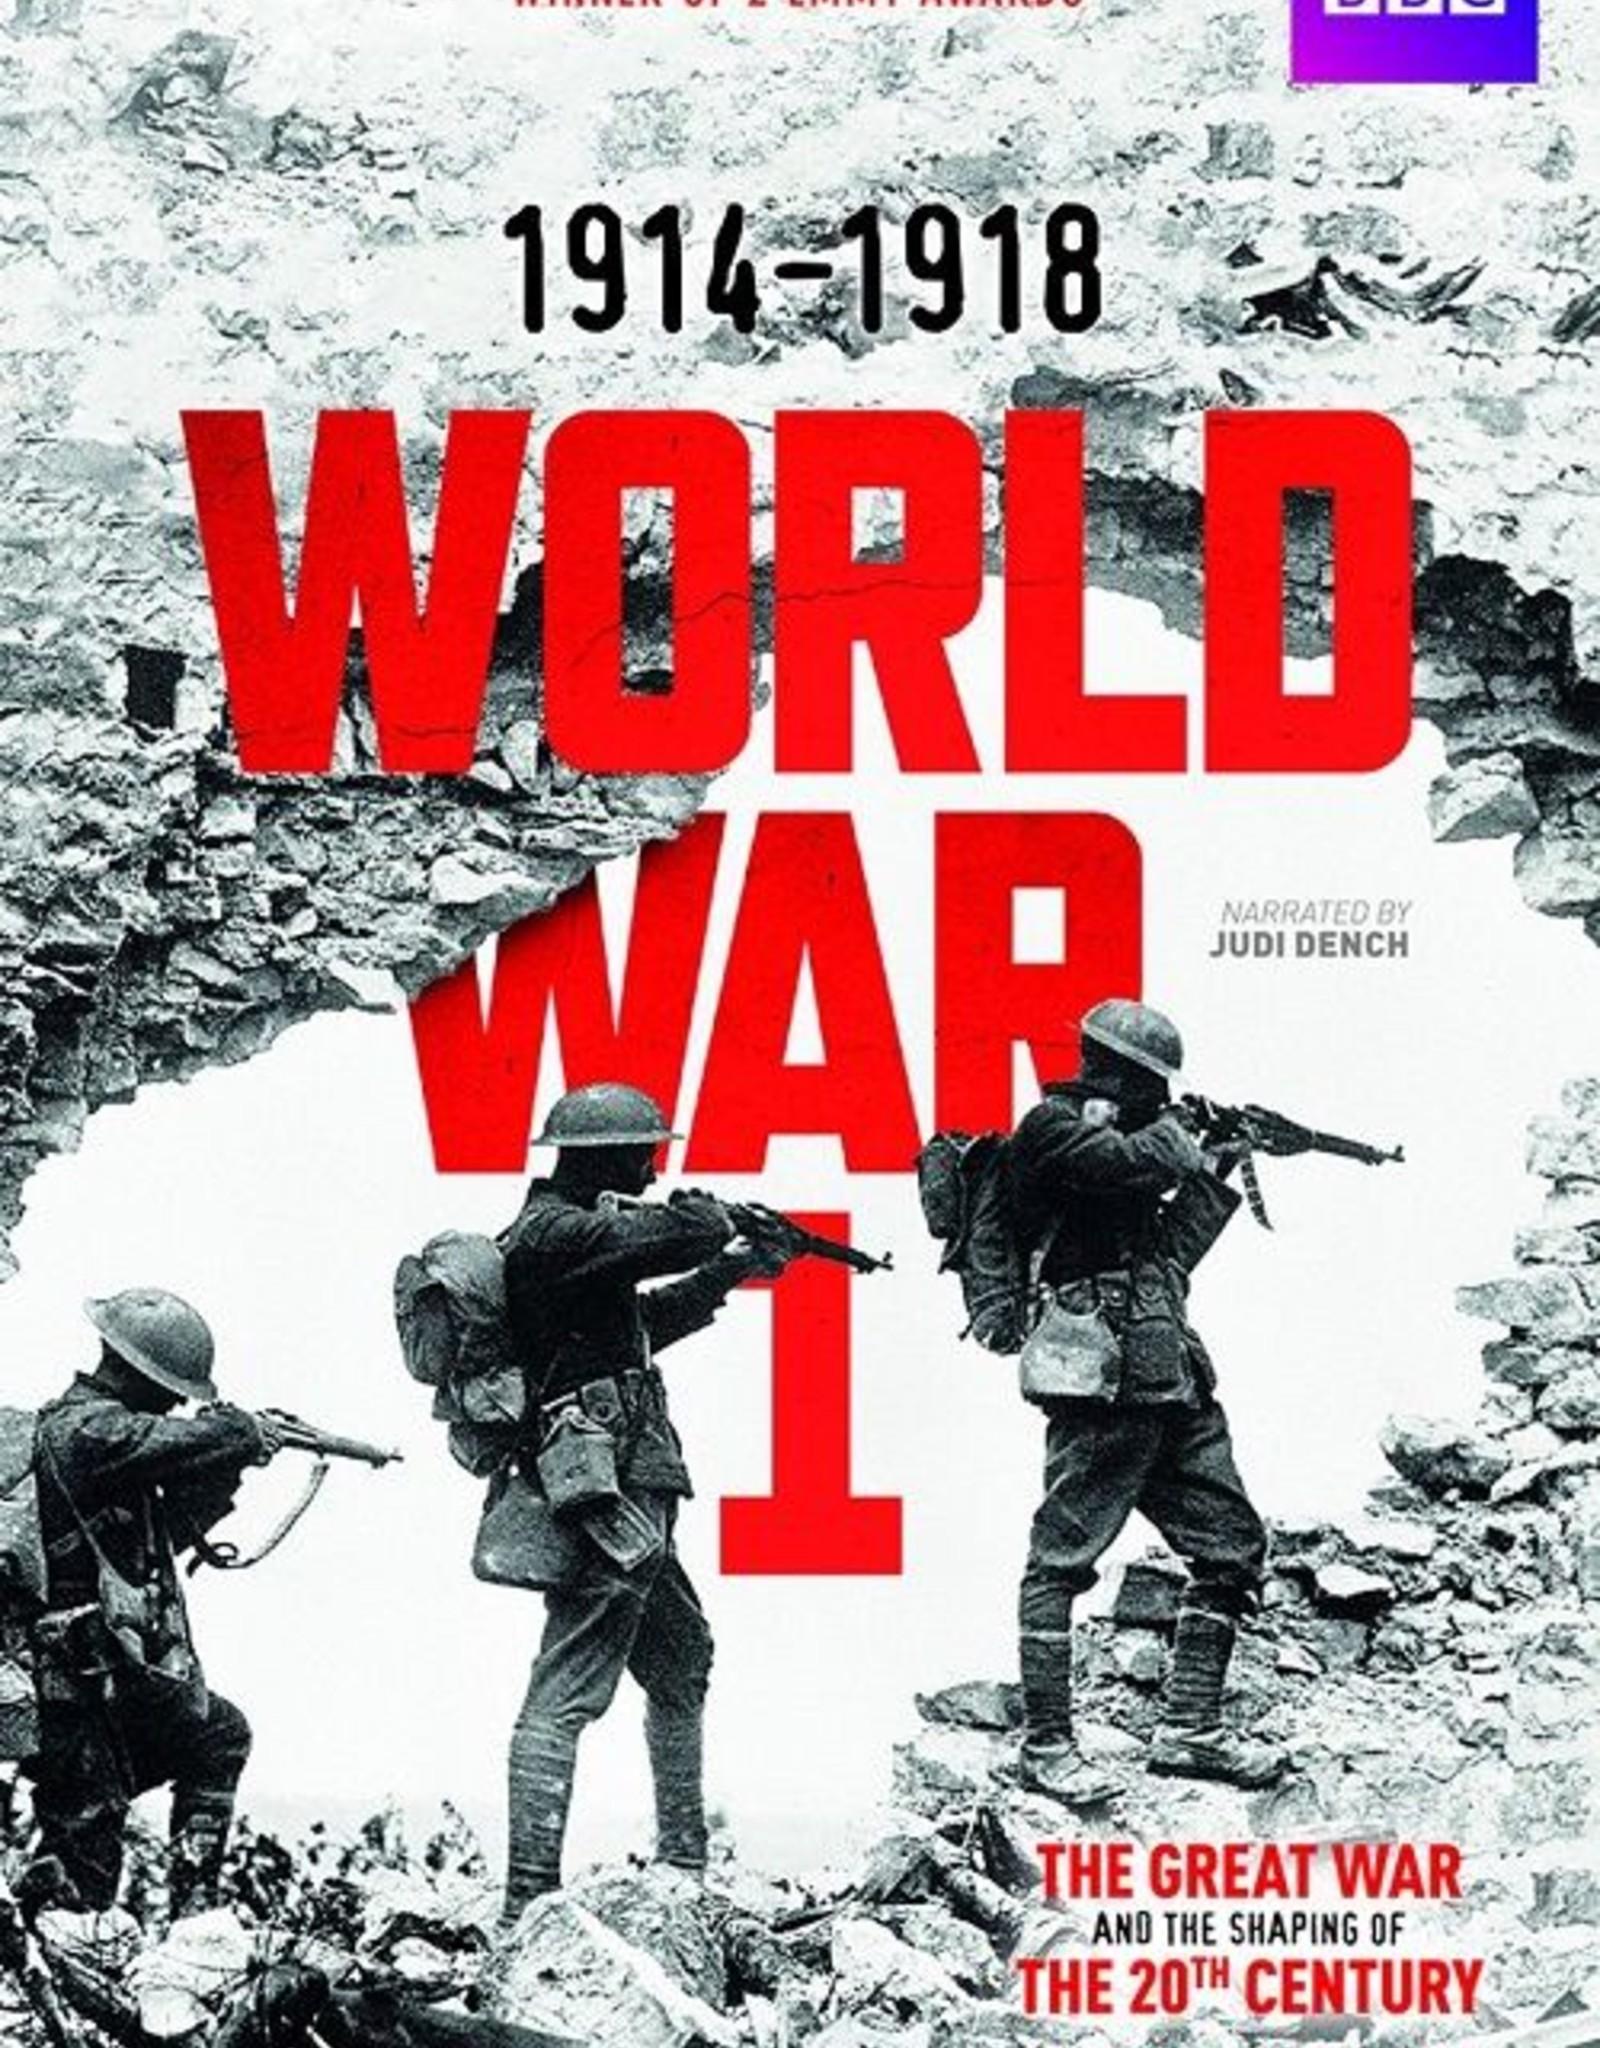 Just Entertainment World War I: 1914-1918 The Great War